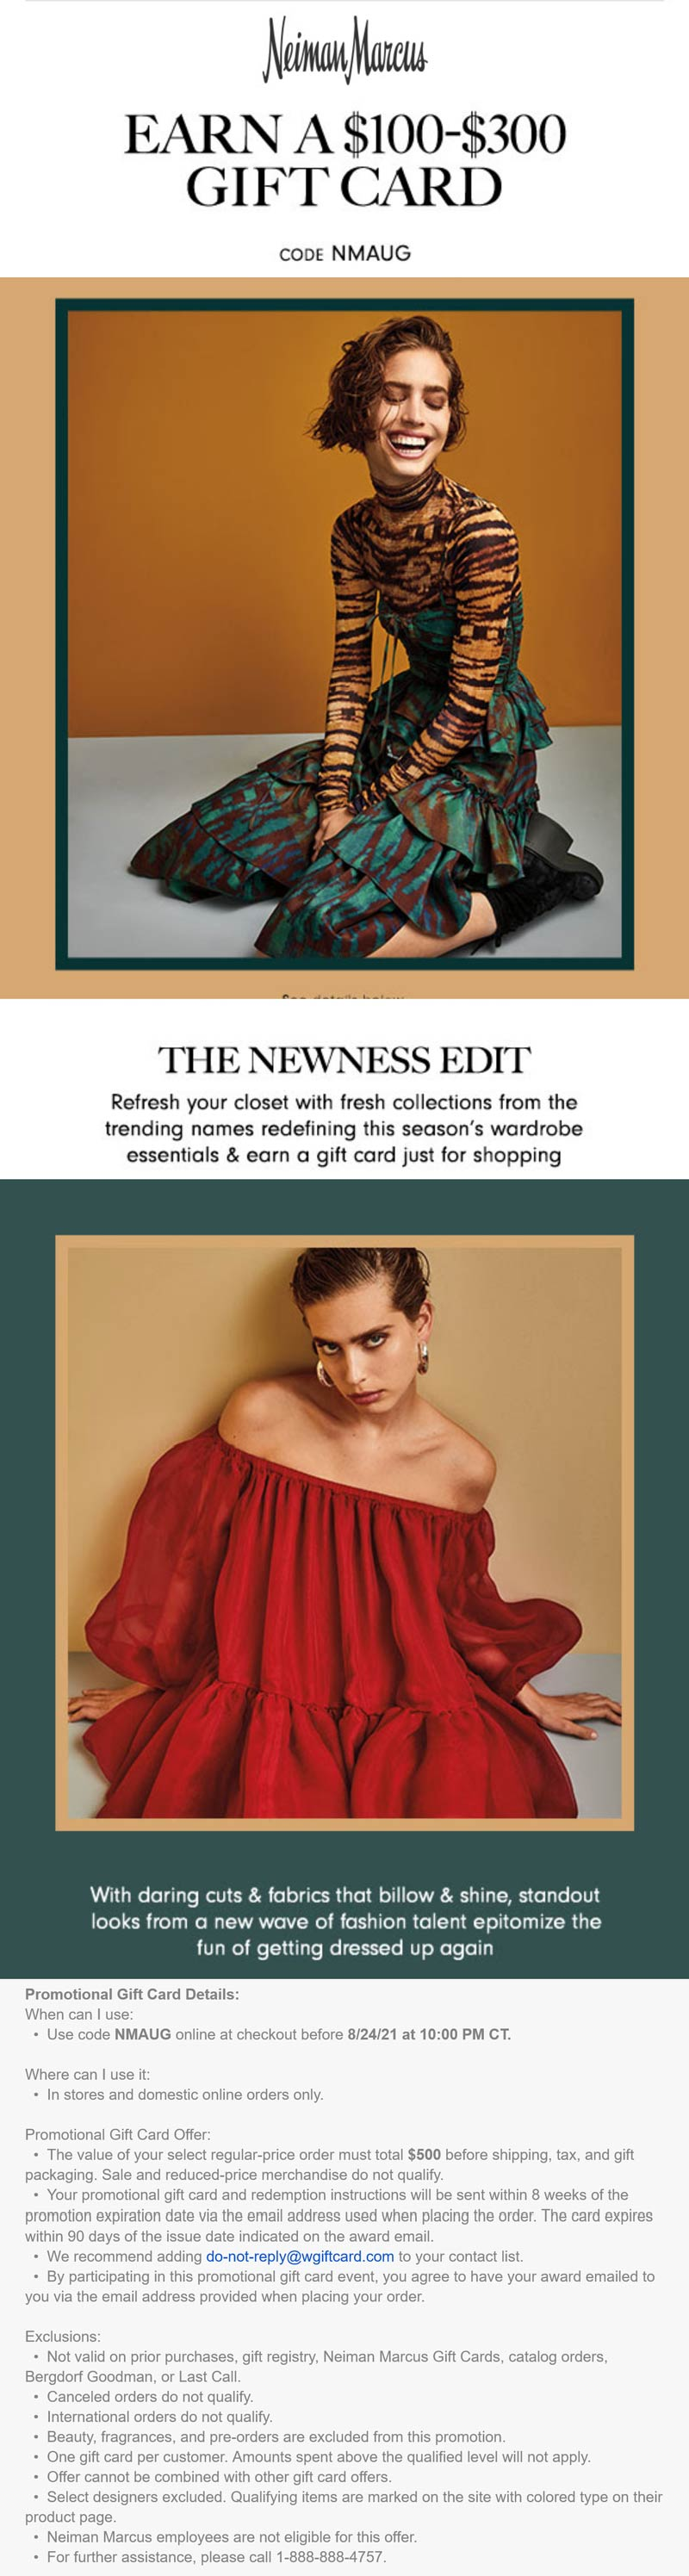 Neiman Marcus stores Coupon  Free $100-$300 card on $500+ today at Neiman Marcus via promo code NMAUG #neimanmarcus